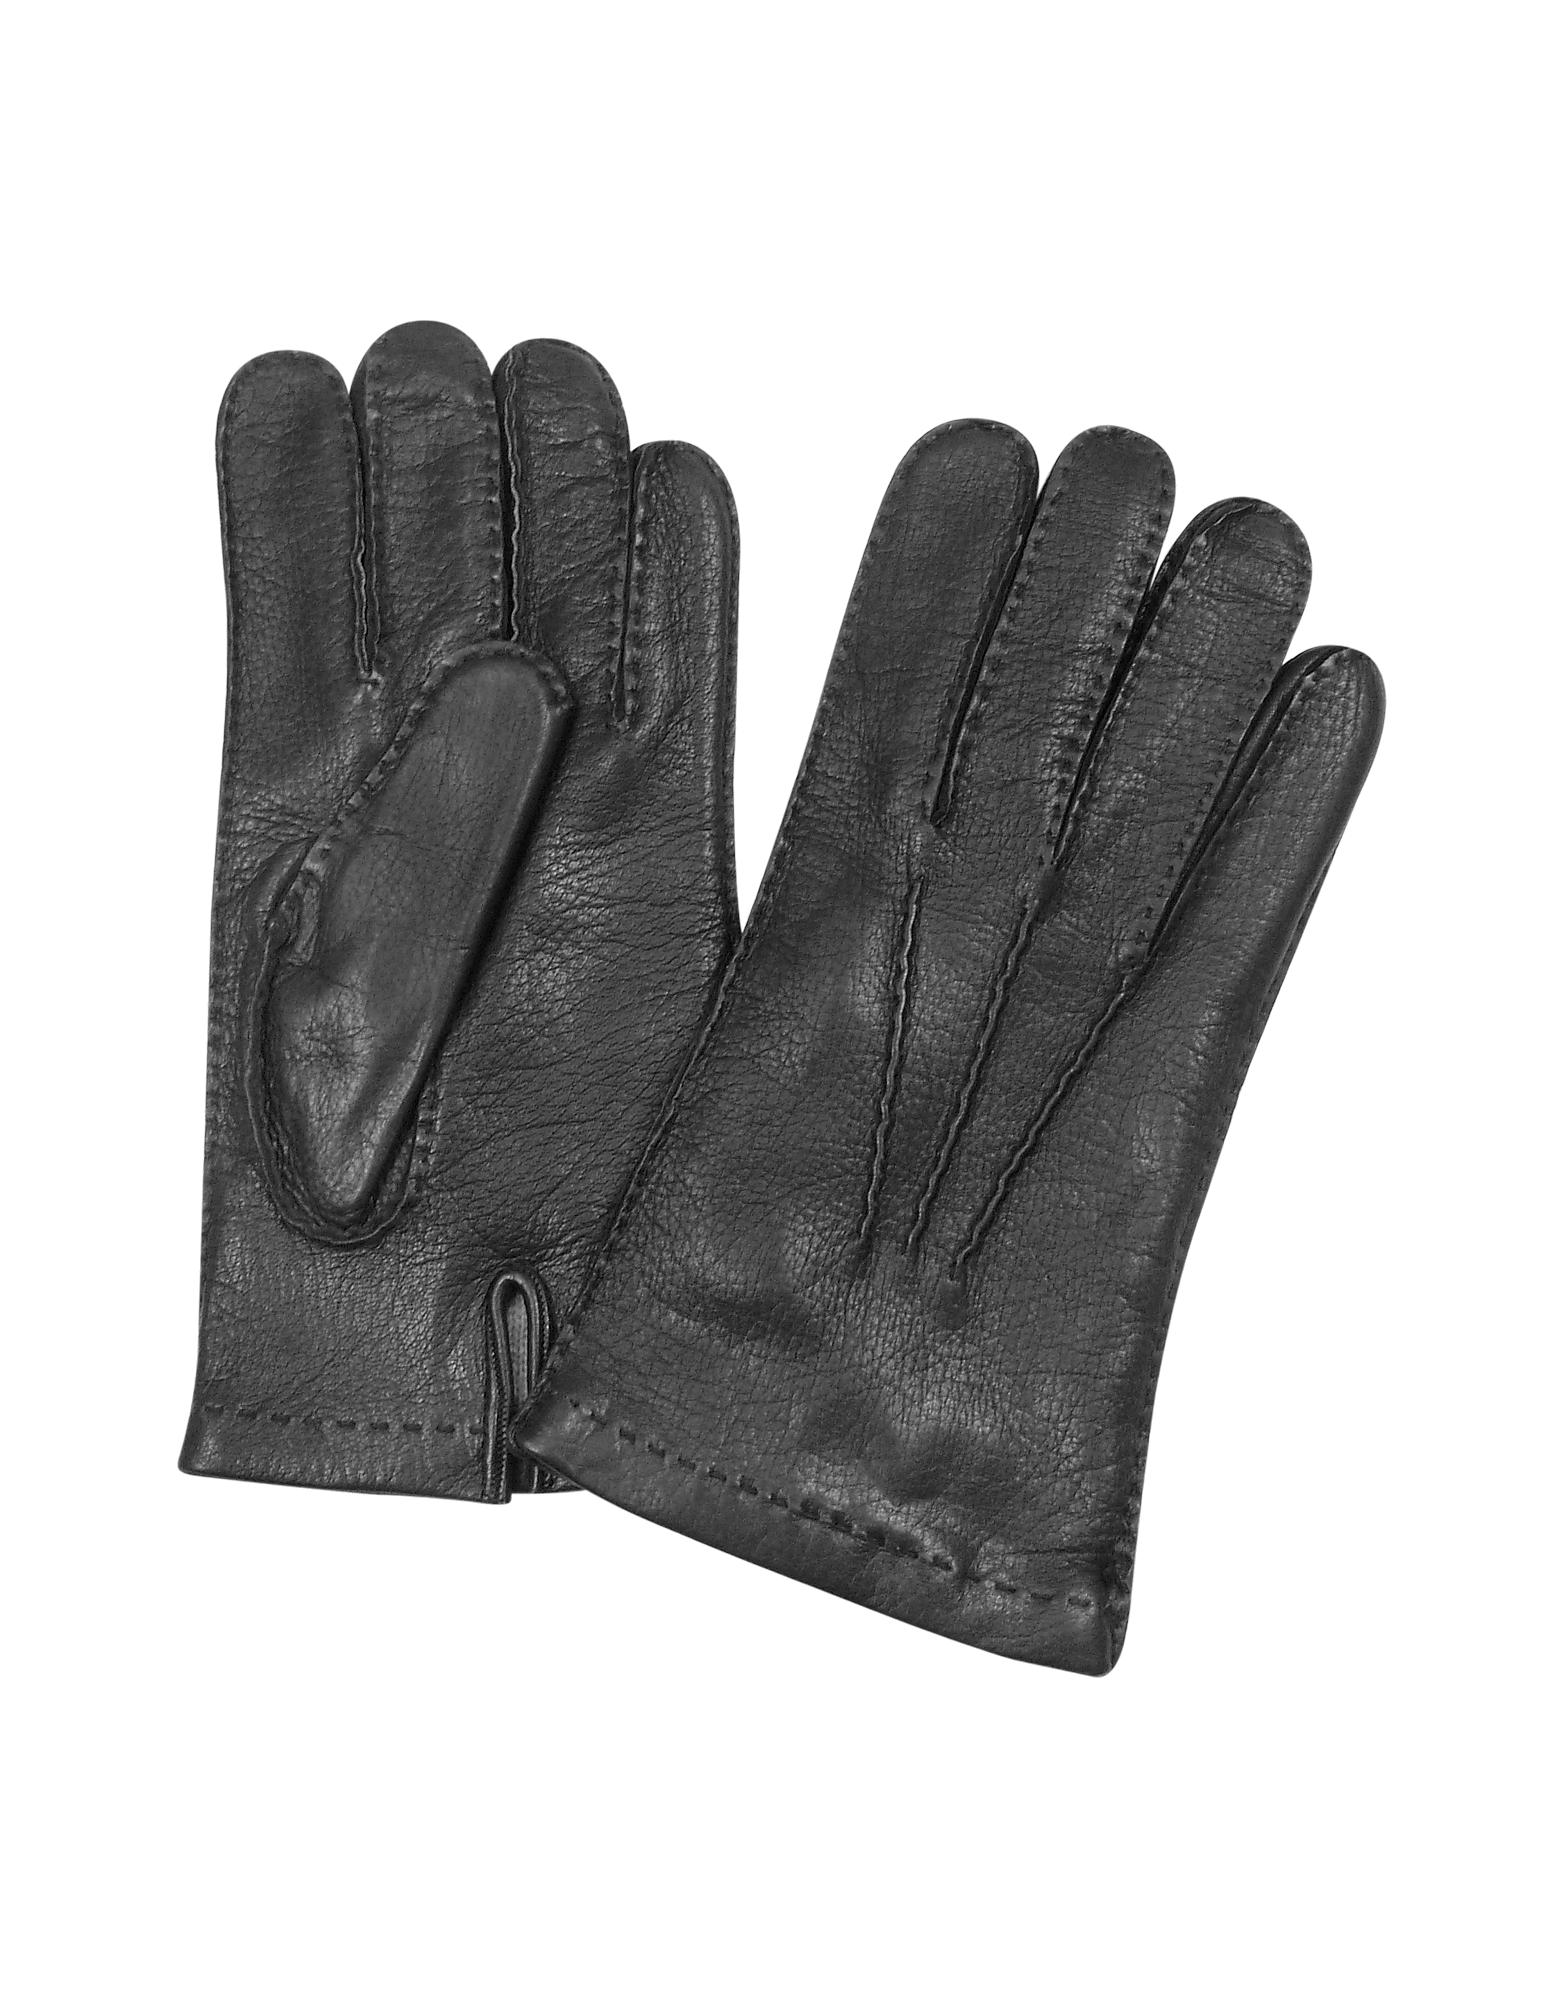 Image of Men's Cashmere Lined Black Italian Deer Leather Gloves